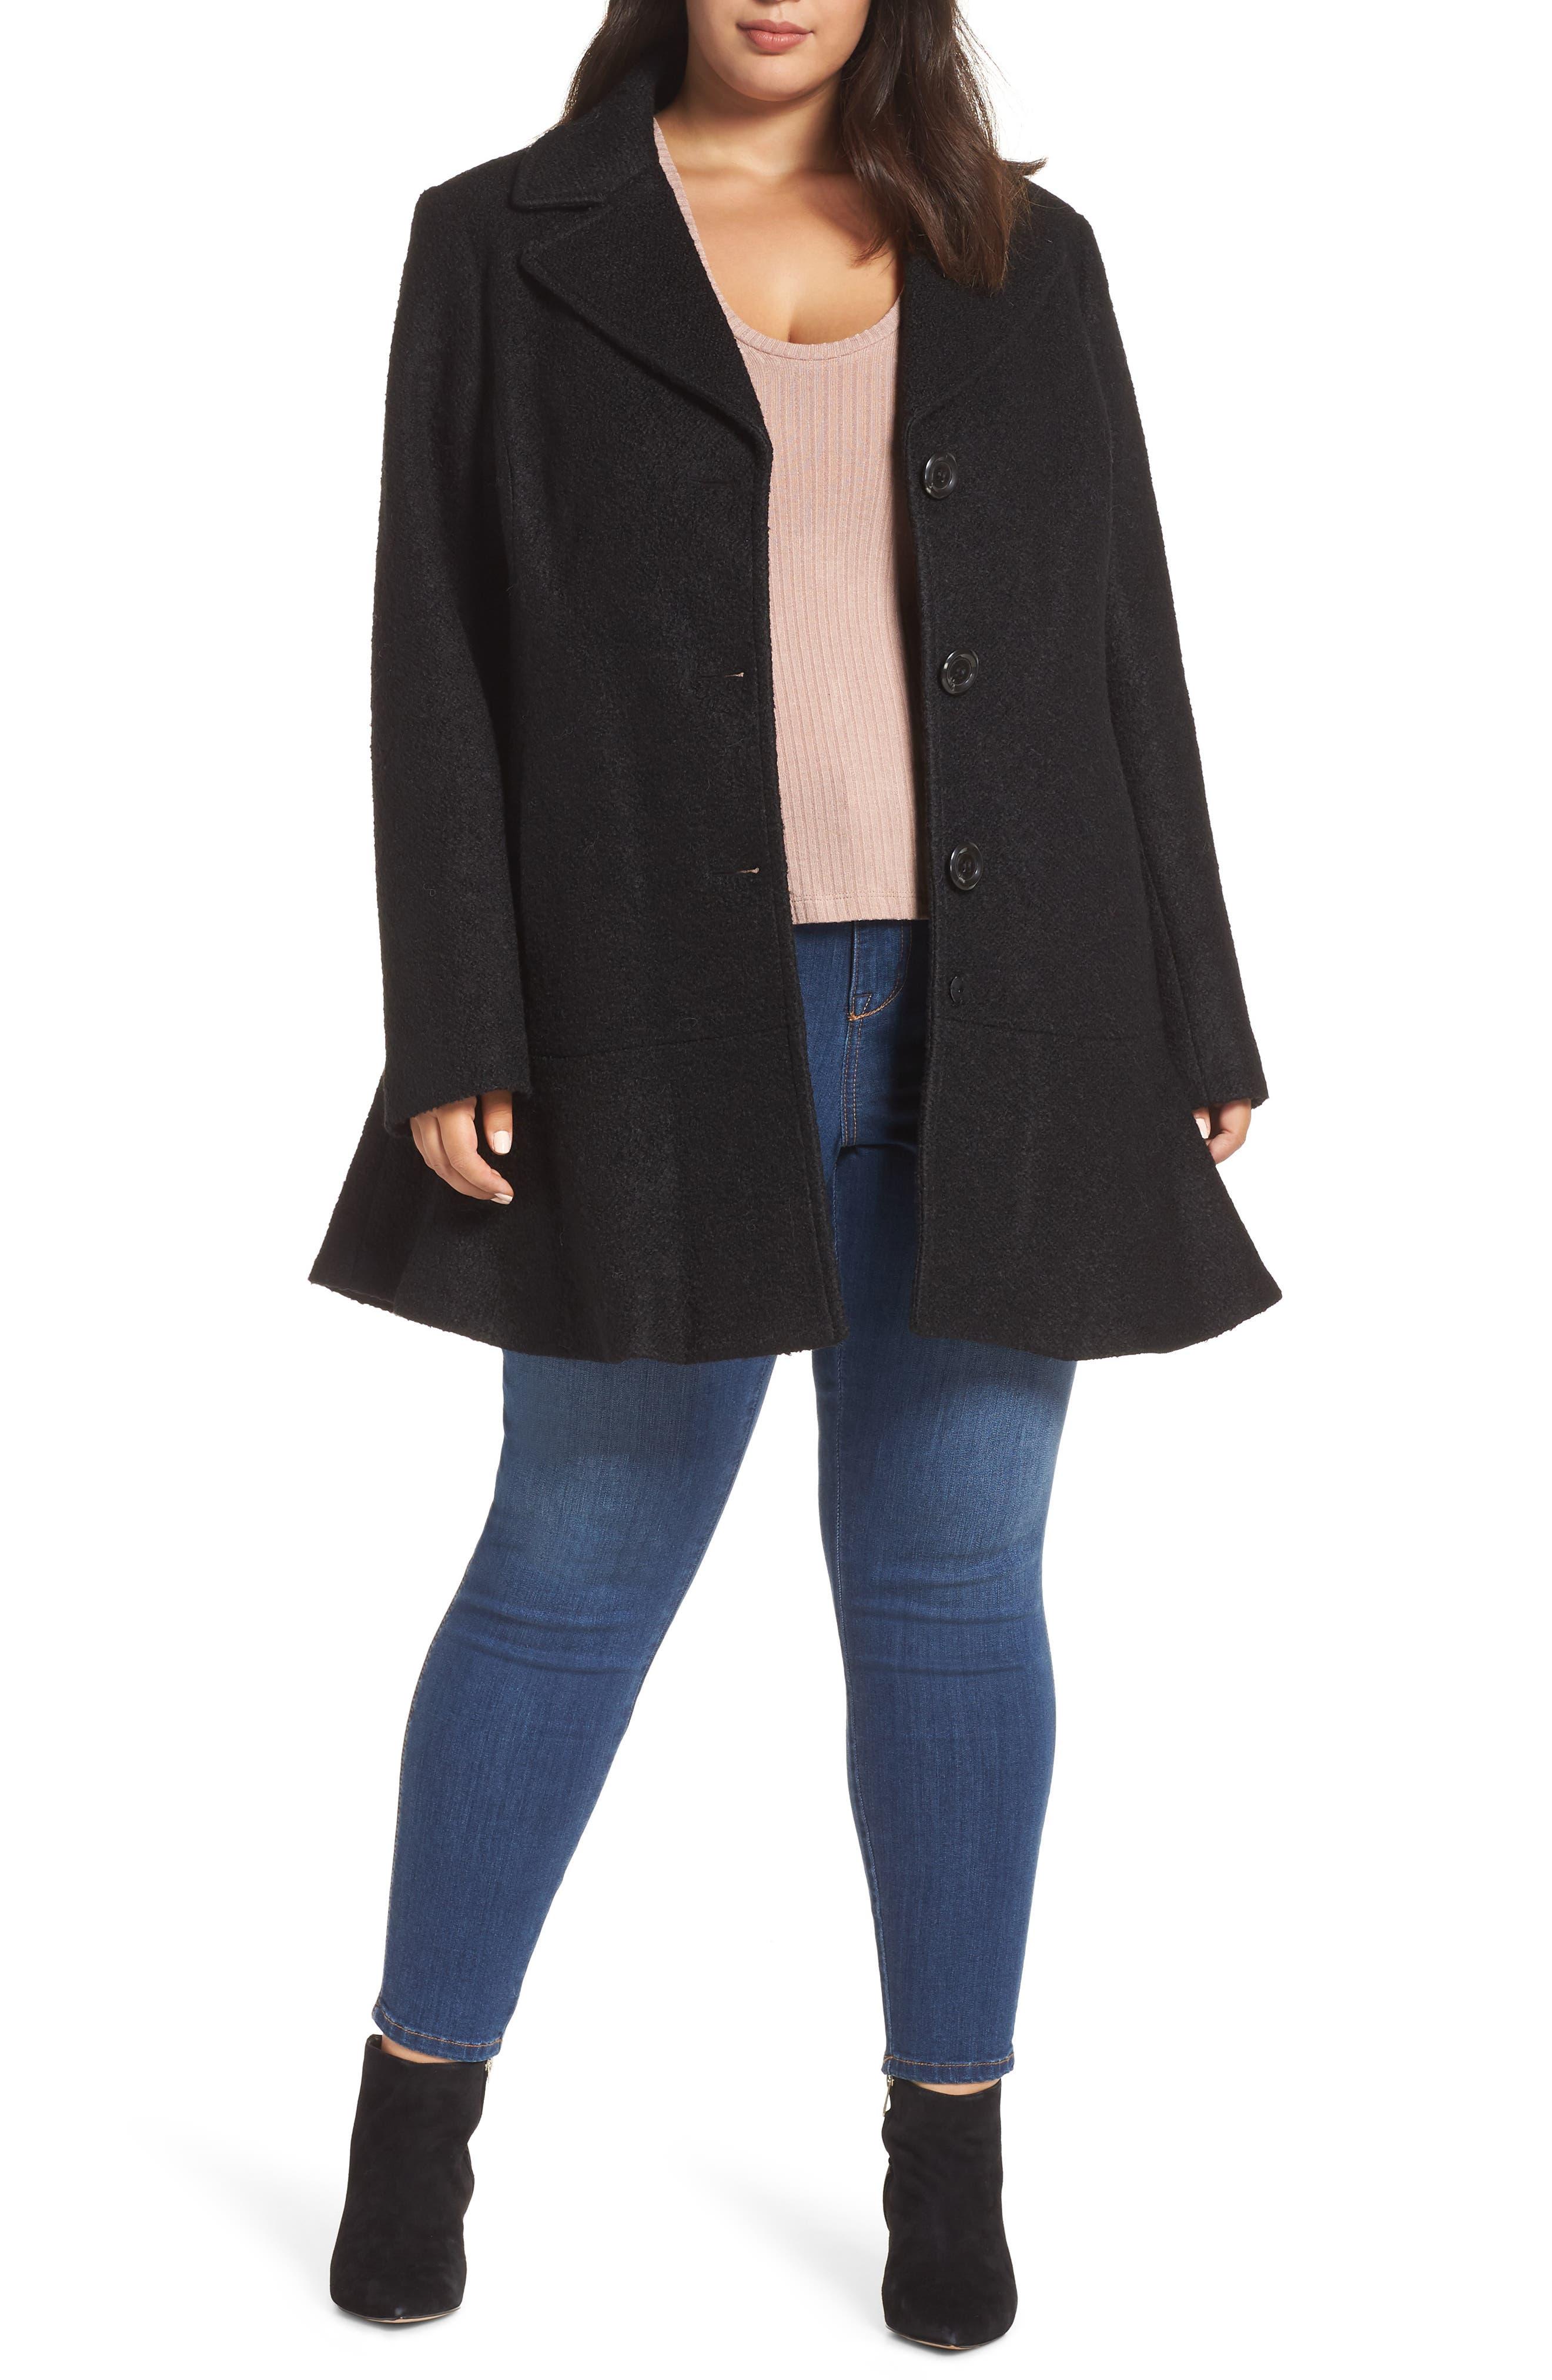 KENSIE, Notch Lapel Peplum Coat, Main thumbnail 1, color, BLACK